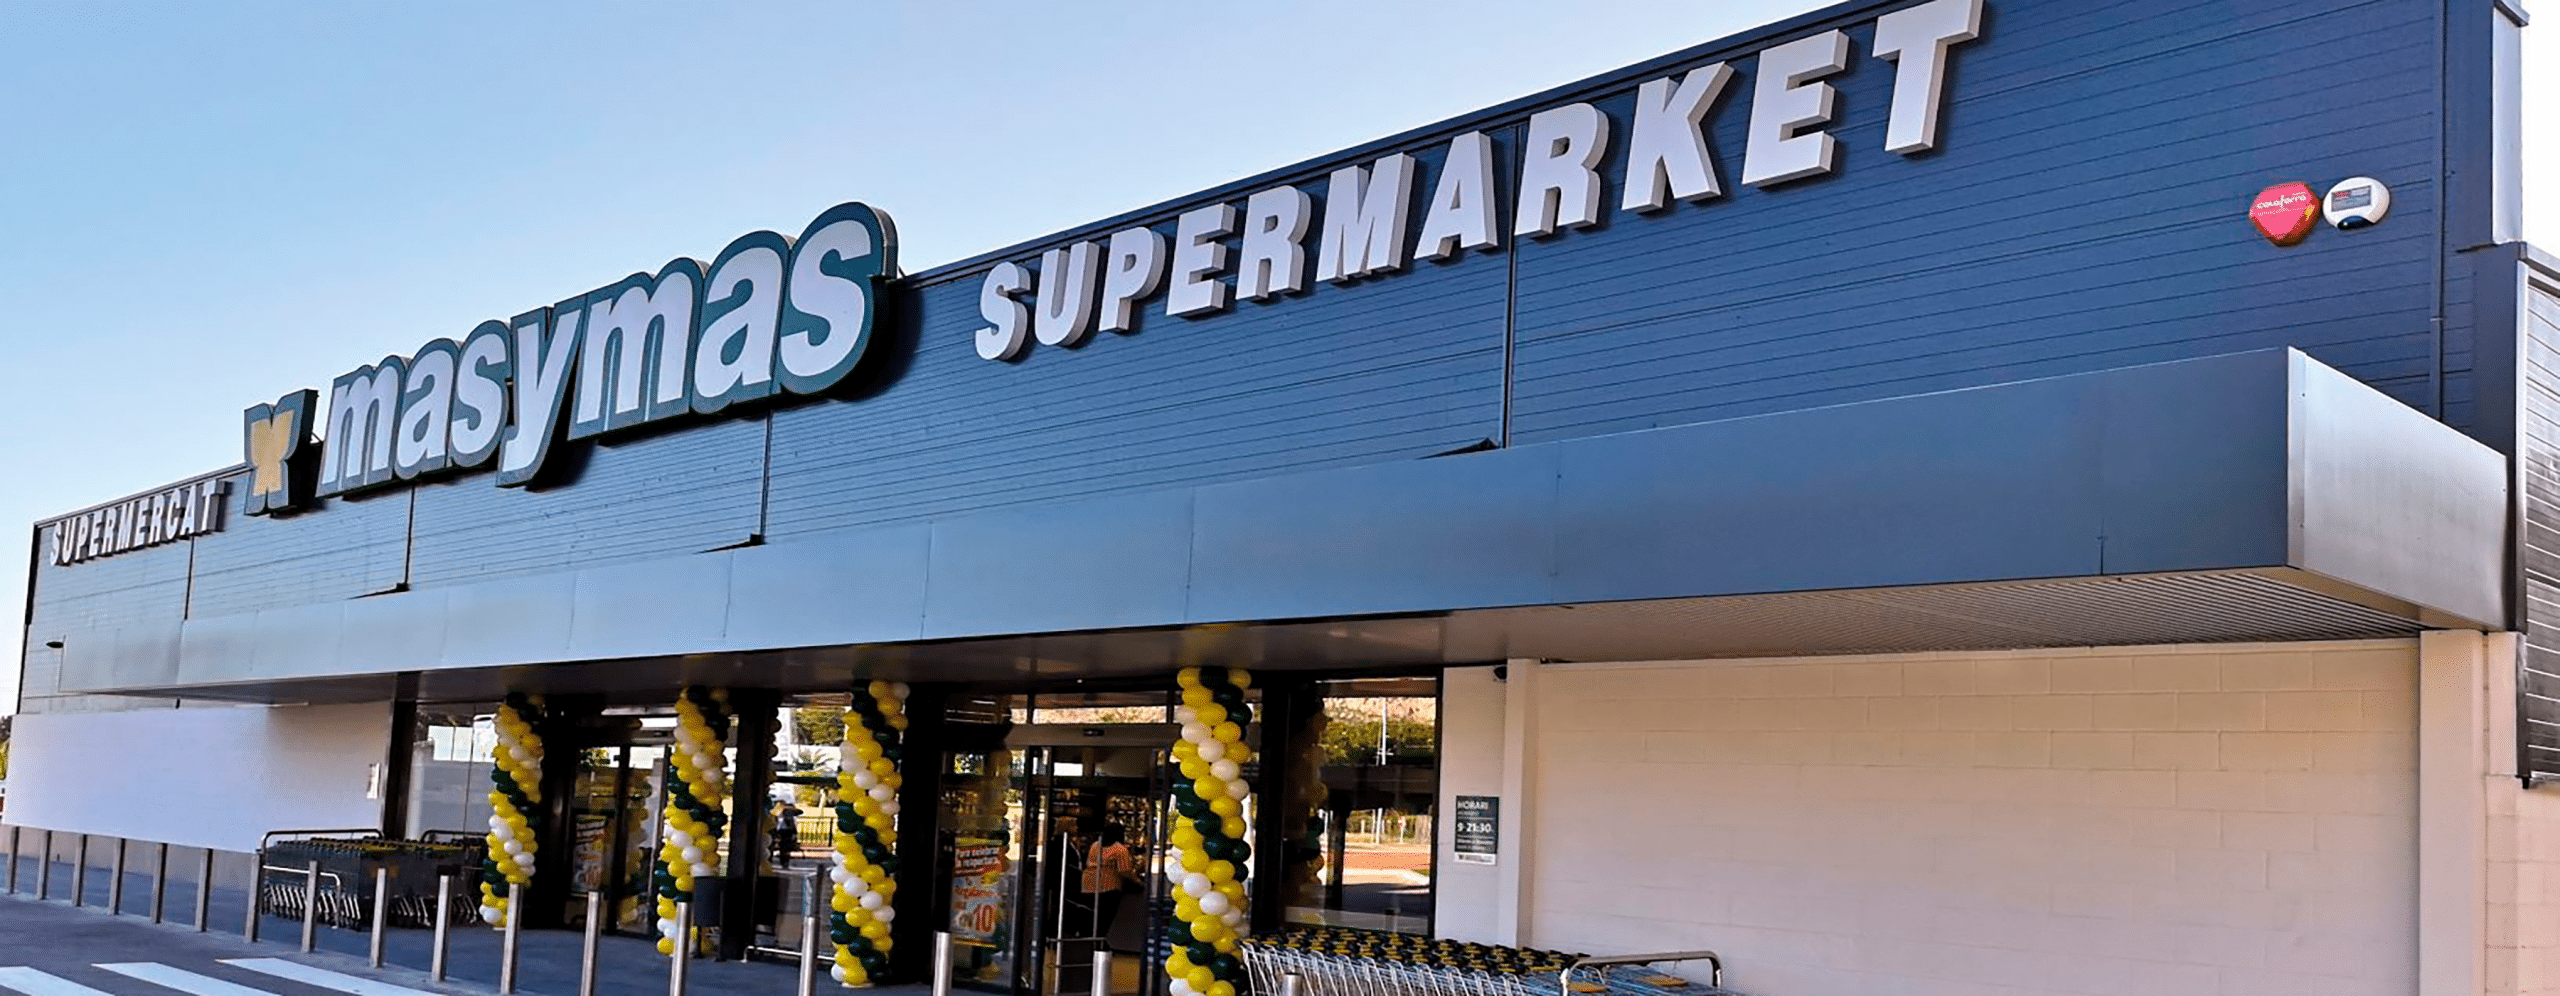 Masymas asturian supermarkets join SISQUAL customers data base in Spain